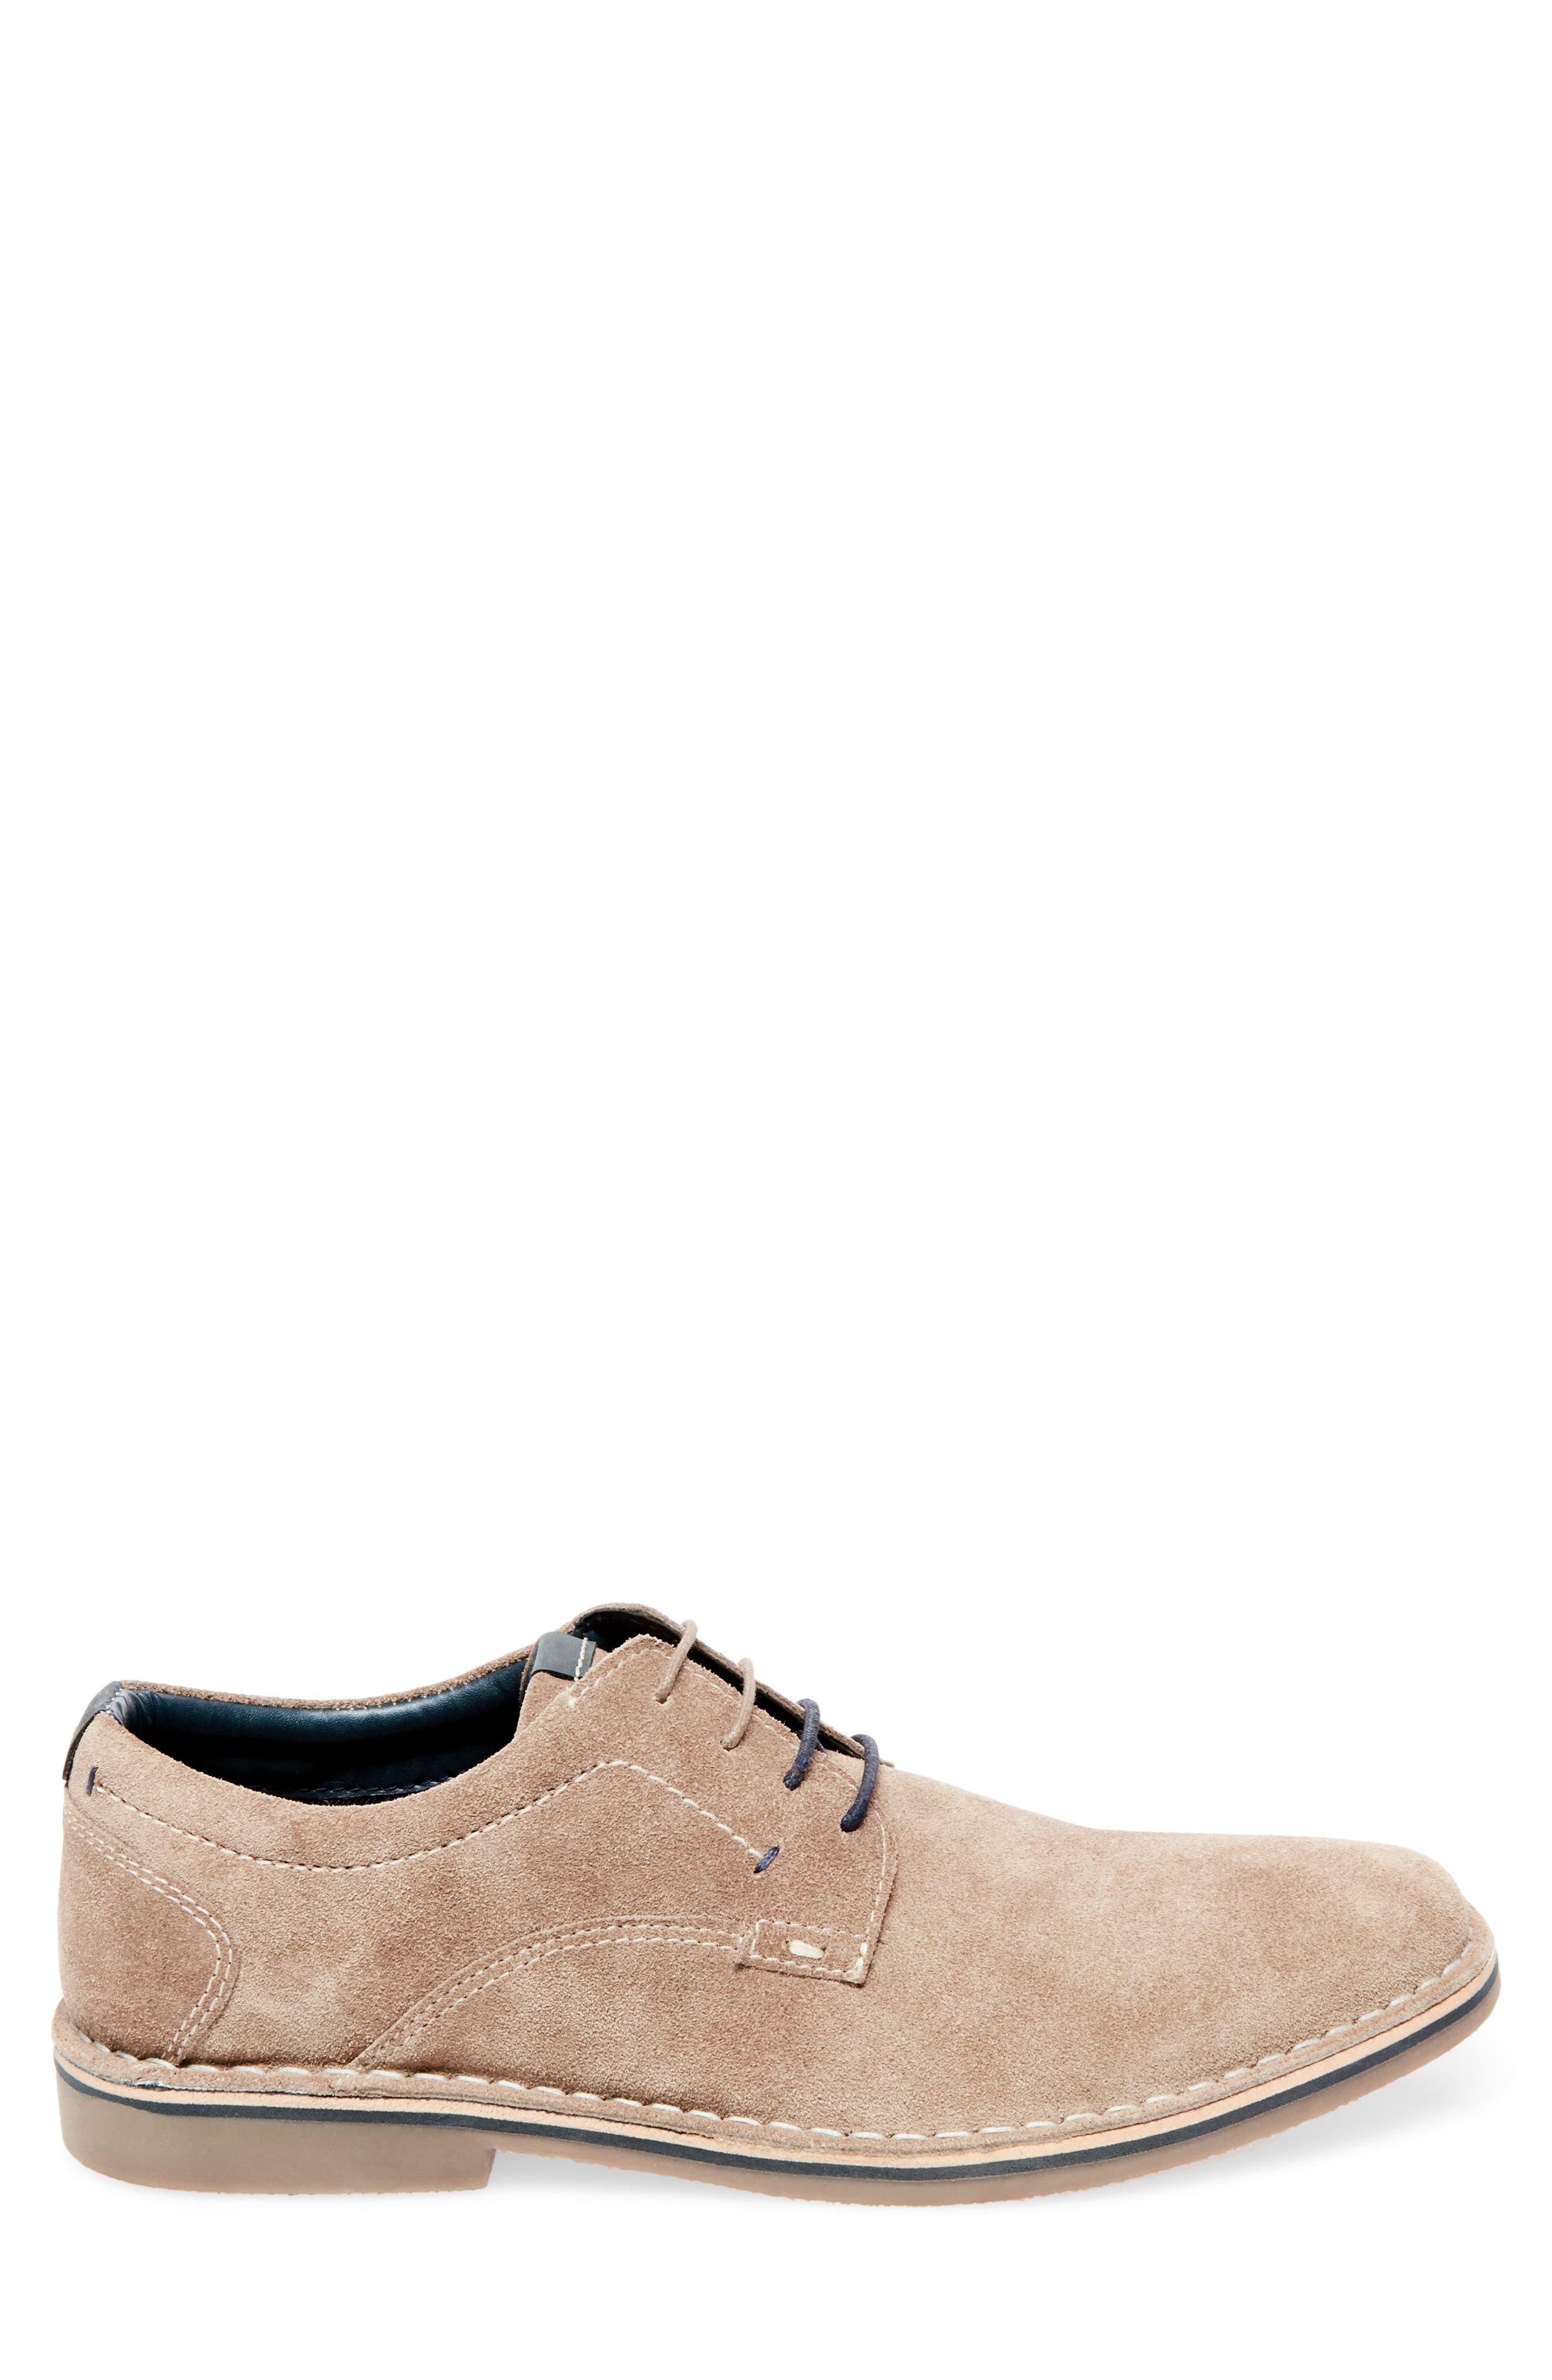 Hatrick Buck Shoe,                             Alternate thumbnail 6, color,